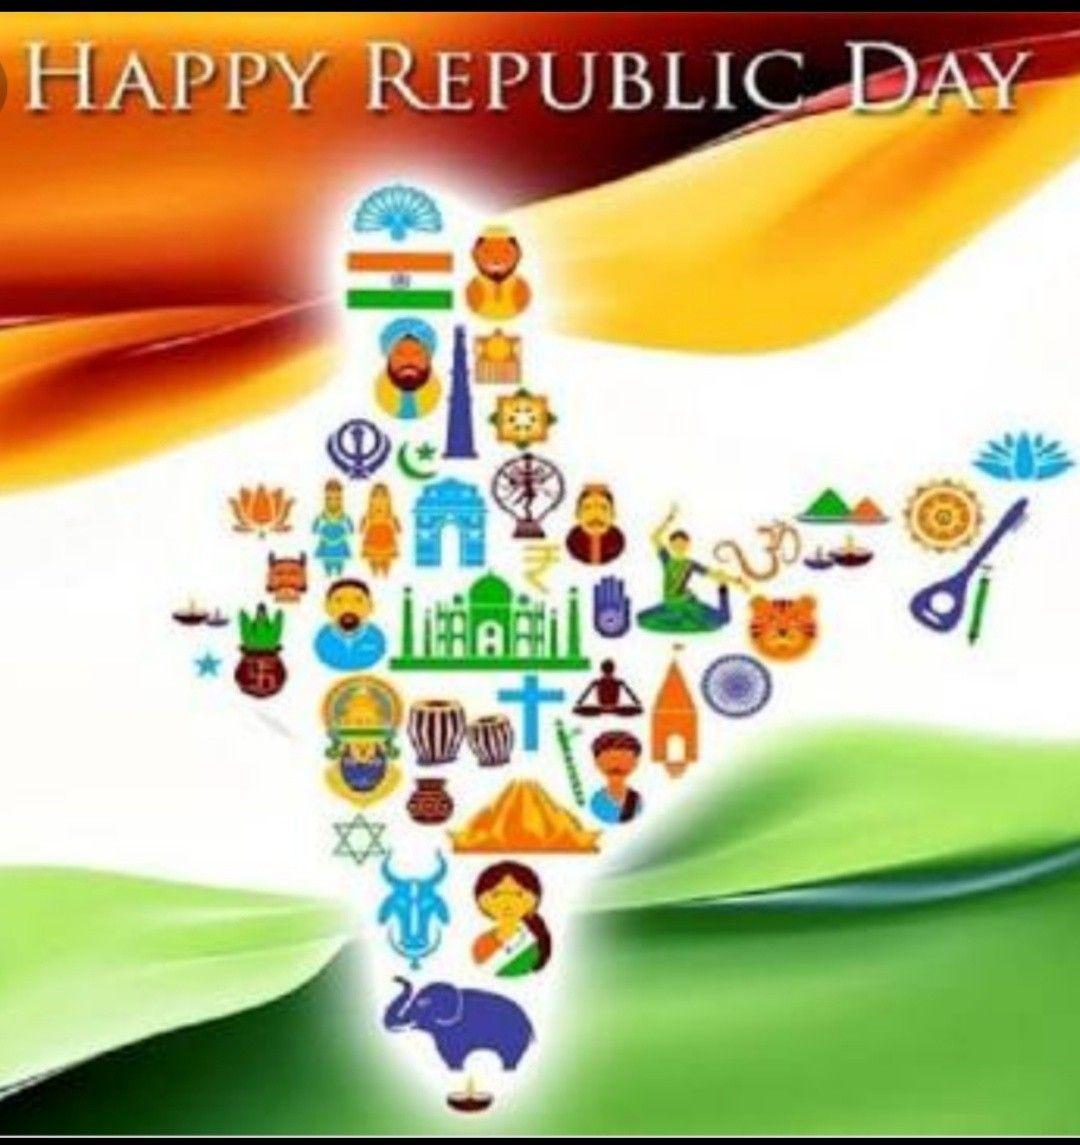 Republic Day Republic Day Happy Republic Day Happy Republic Day 2020 Happy republic day images with good